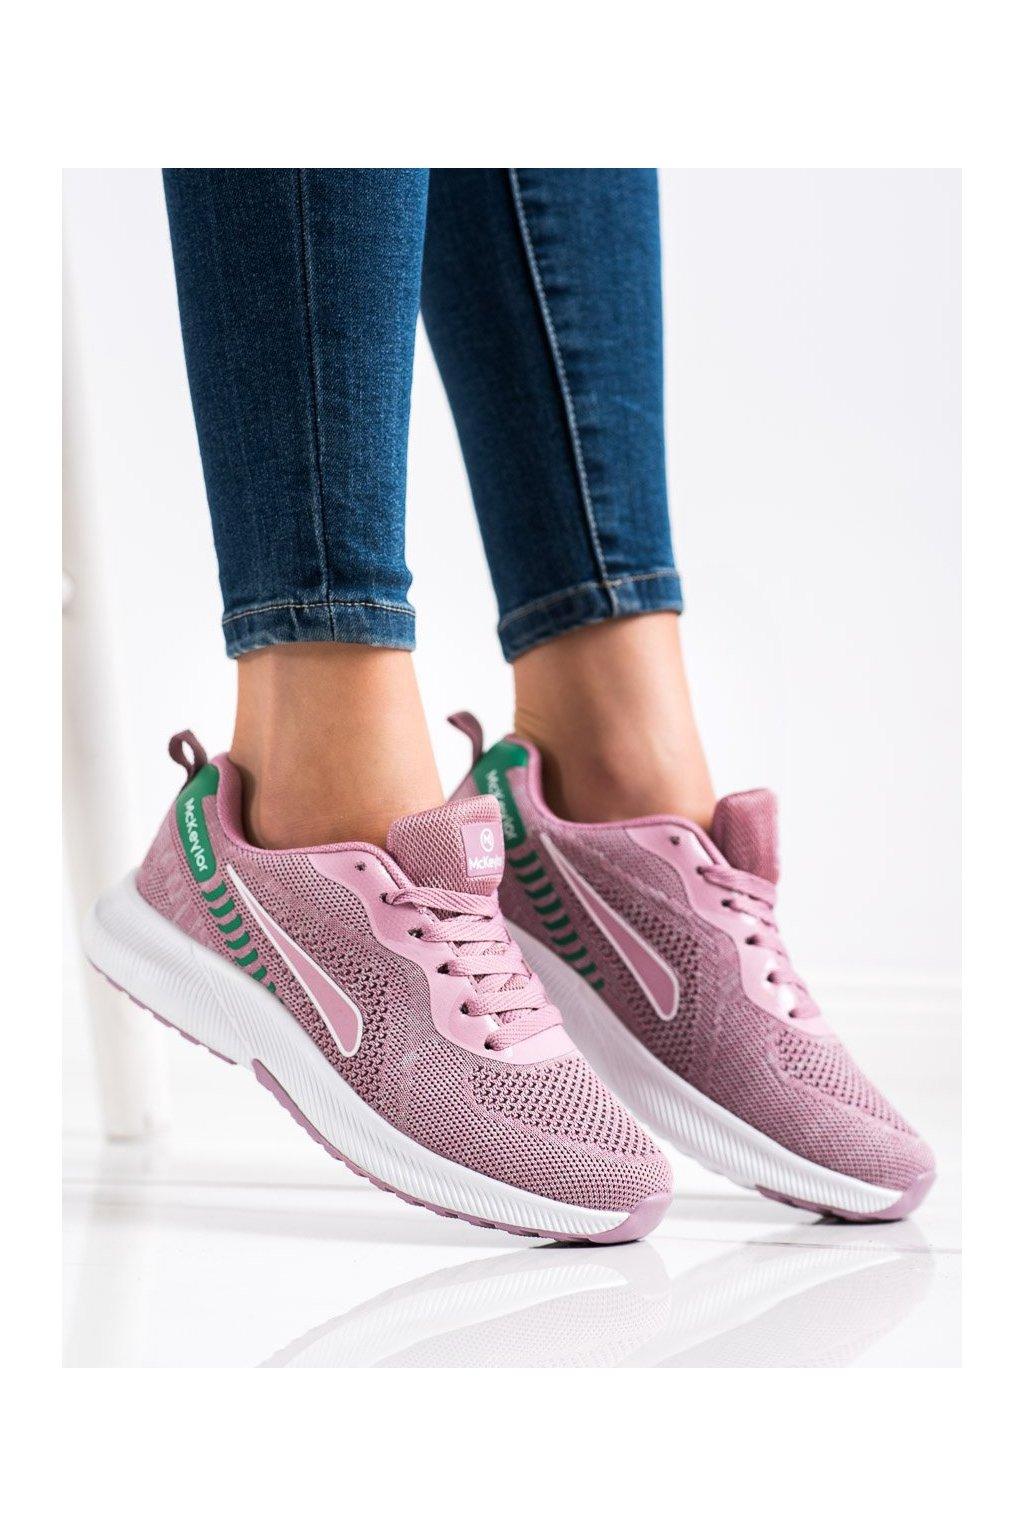 Ružové tenisky Mckeylor kod GIN21-20608P